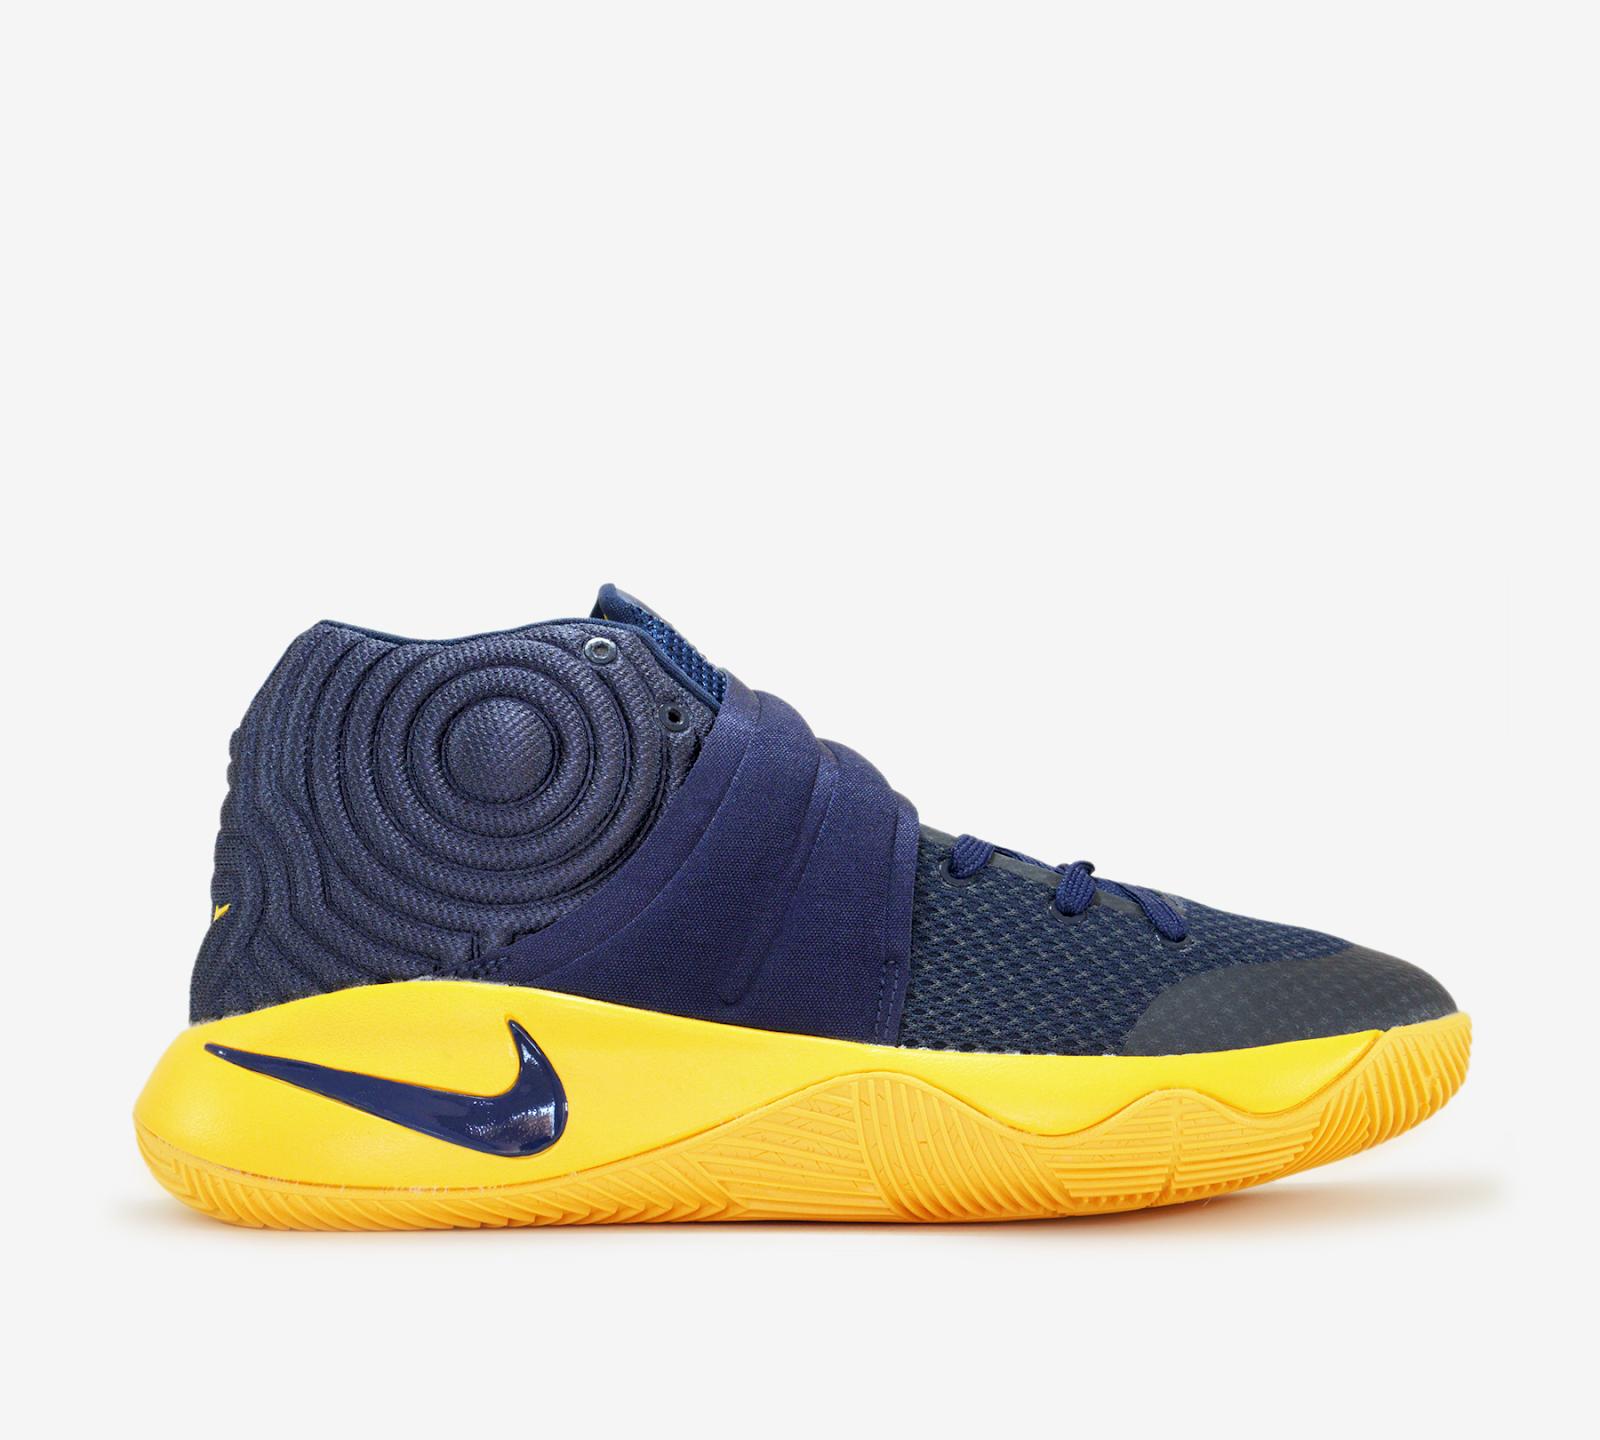 Nike Kyrie 2 chuyên gia bóng rổ.